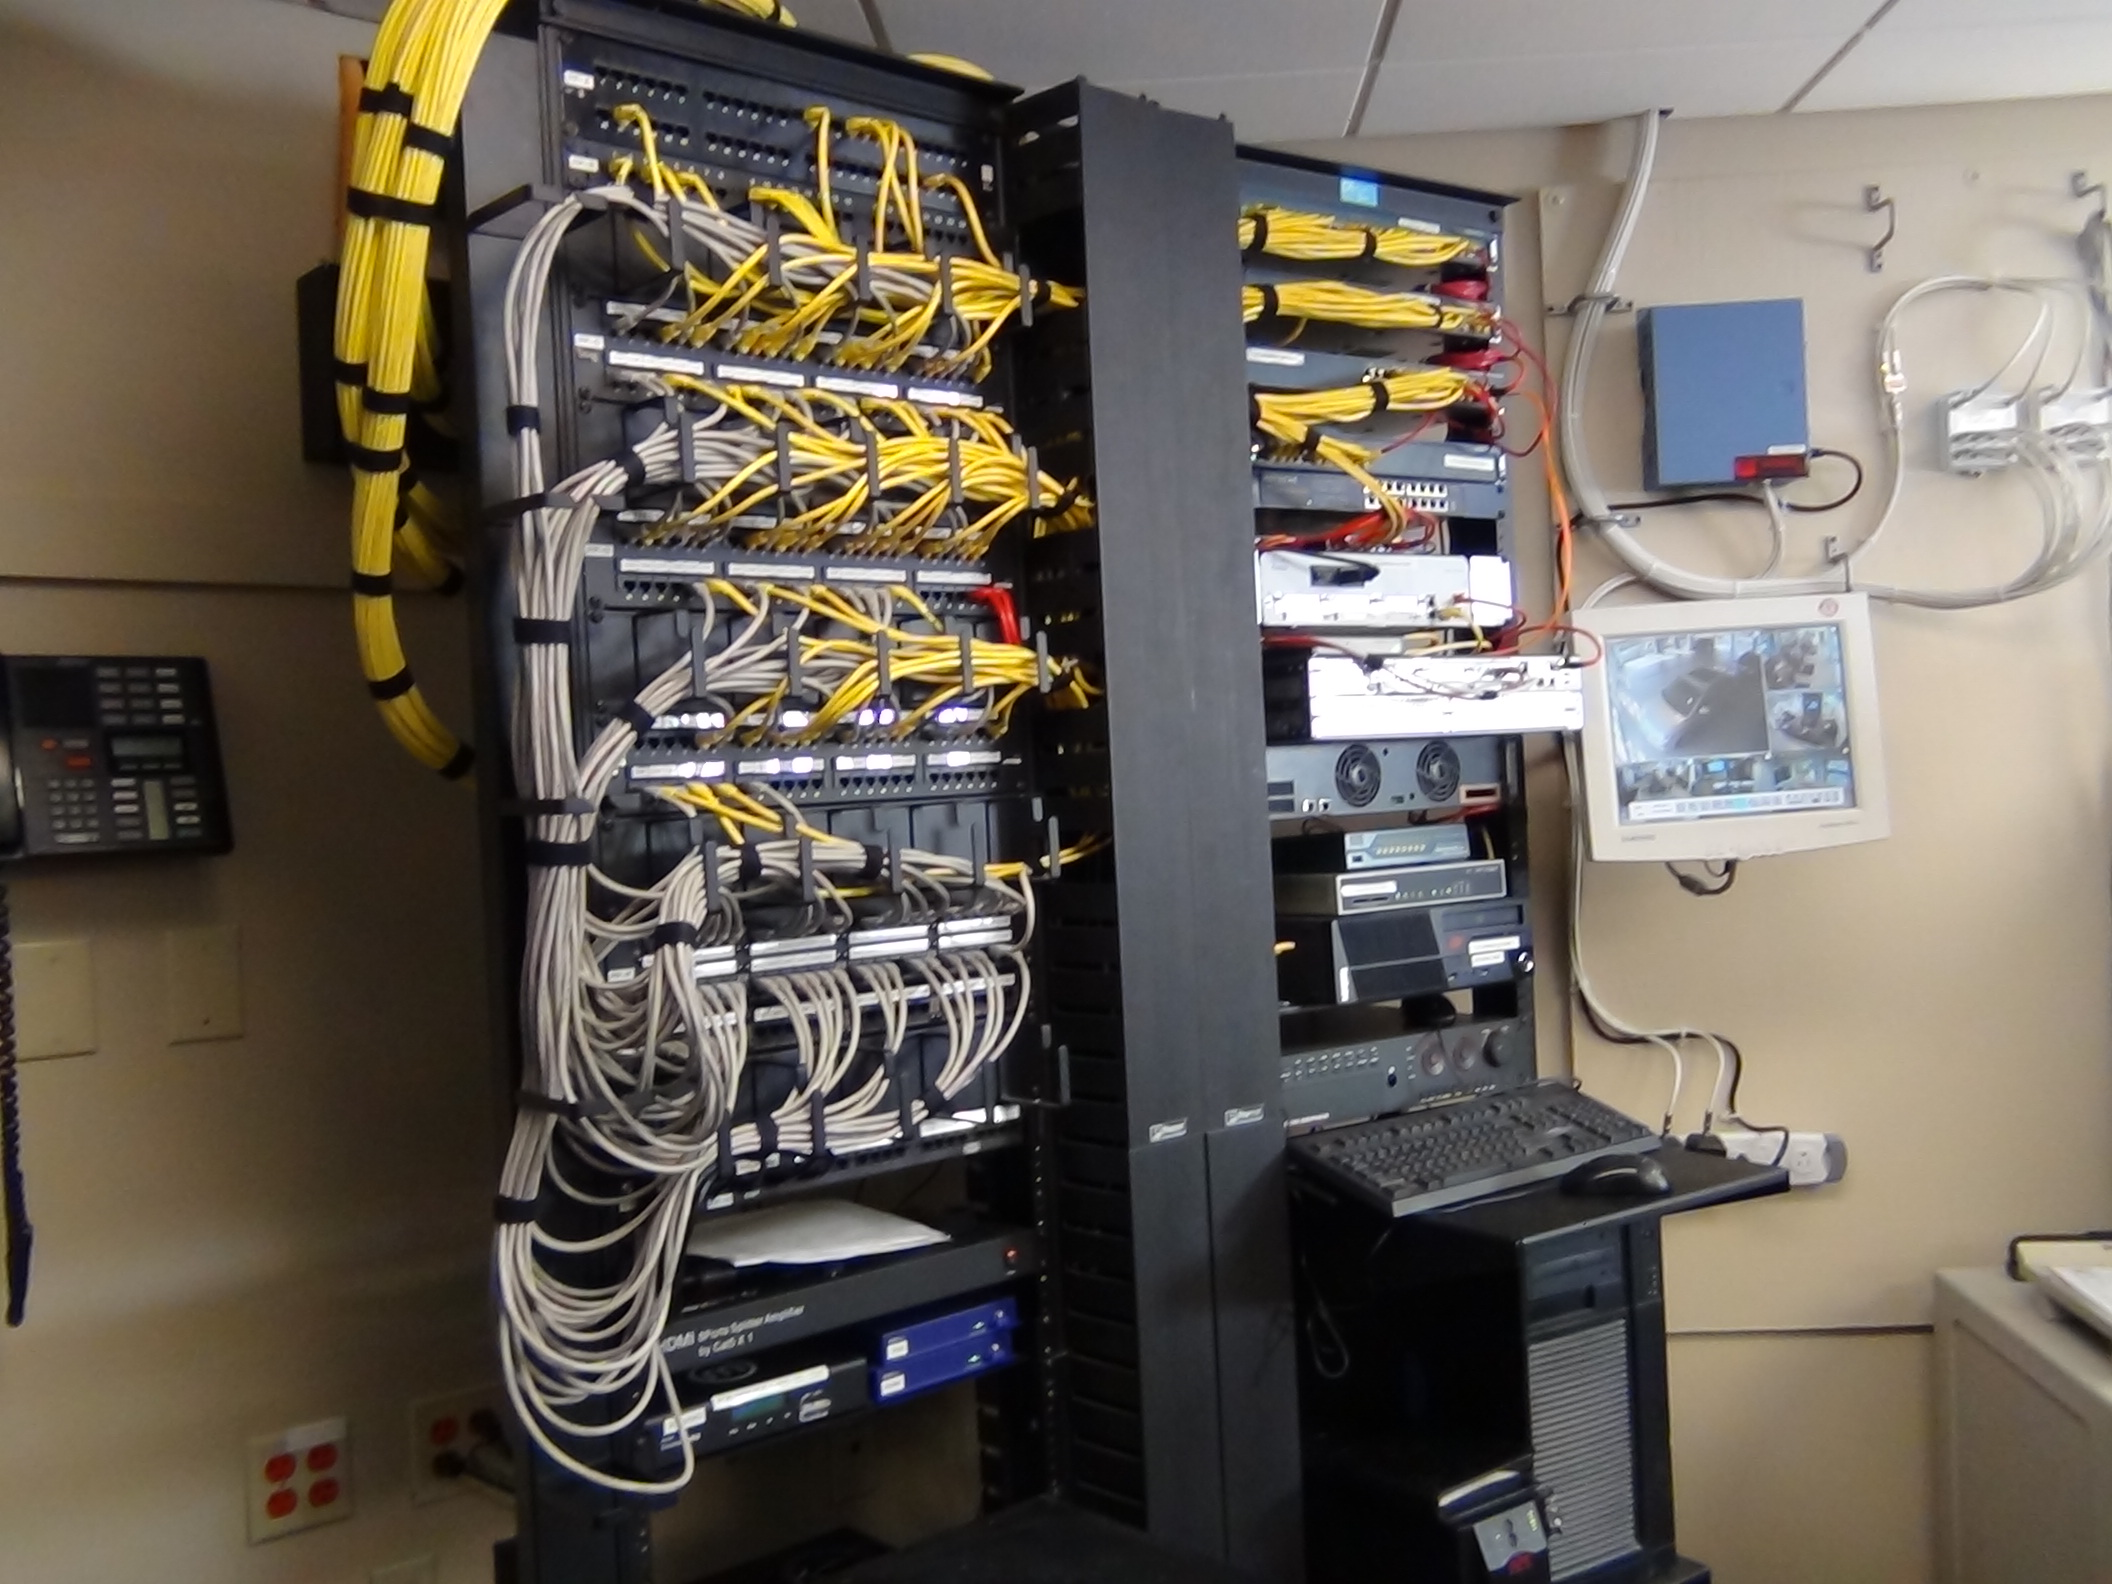 data racks, Dan Tobin